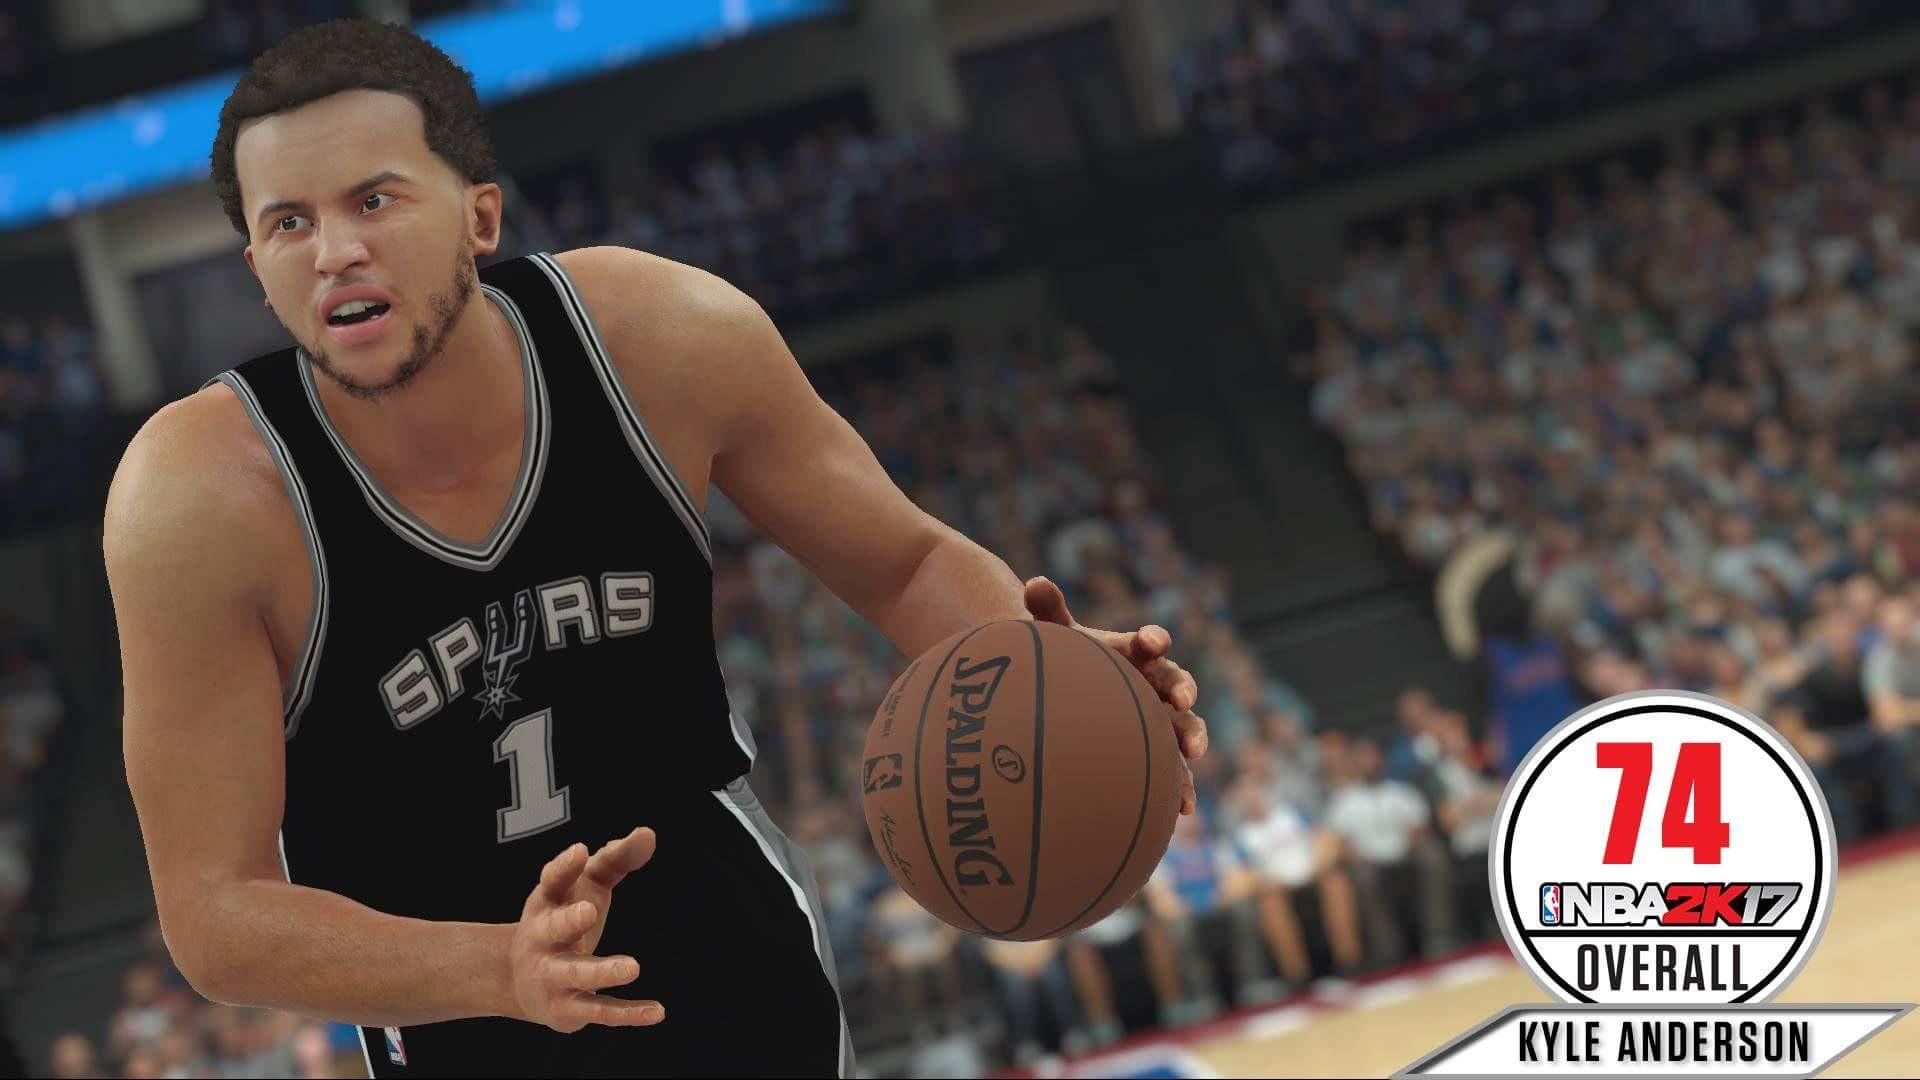 NBA 2K17 Screenshot 244 For PS4 Operation Sports